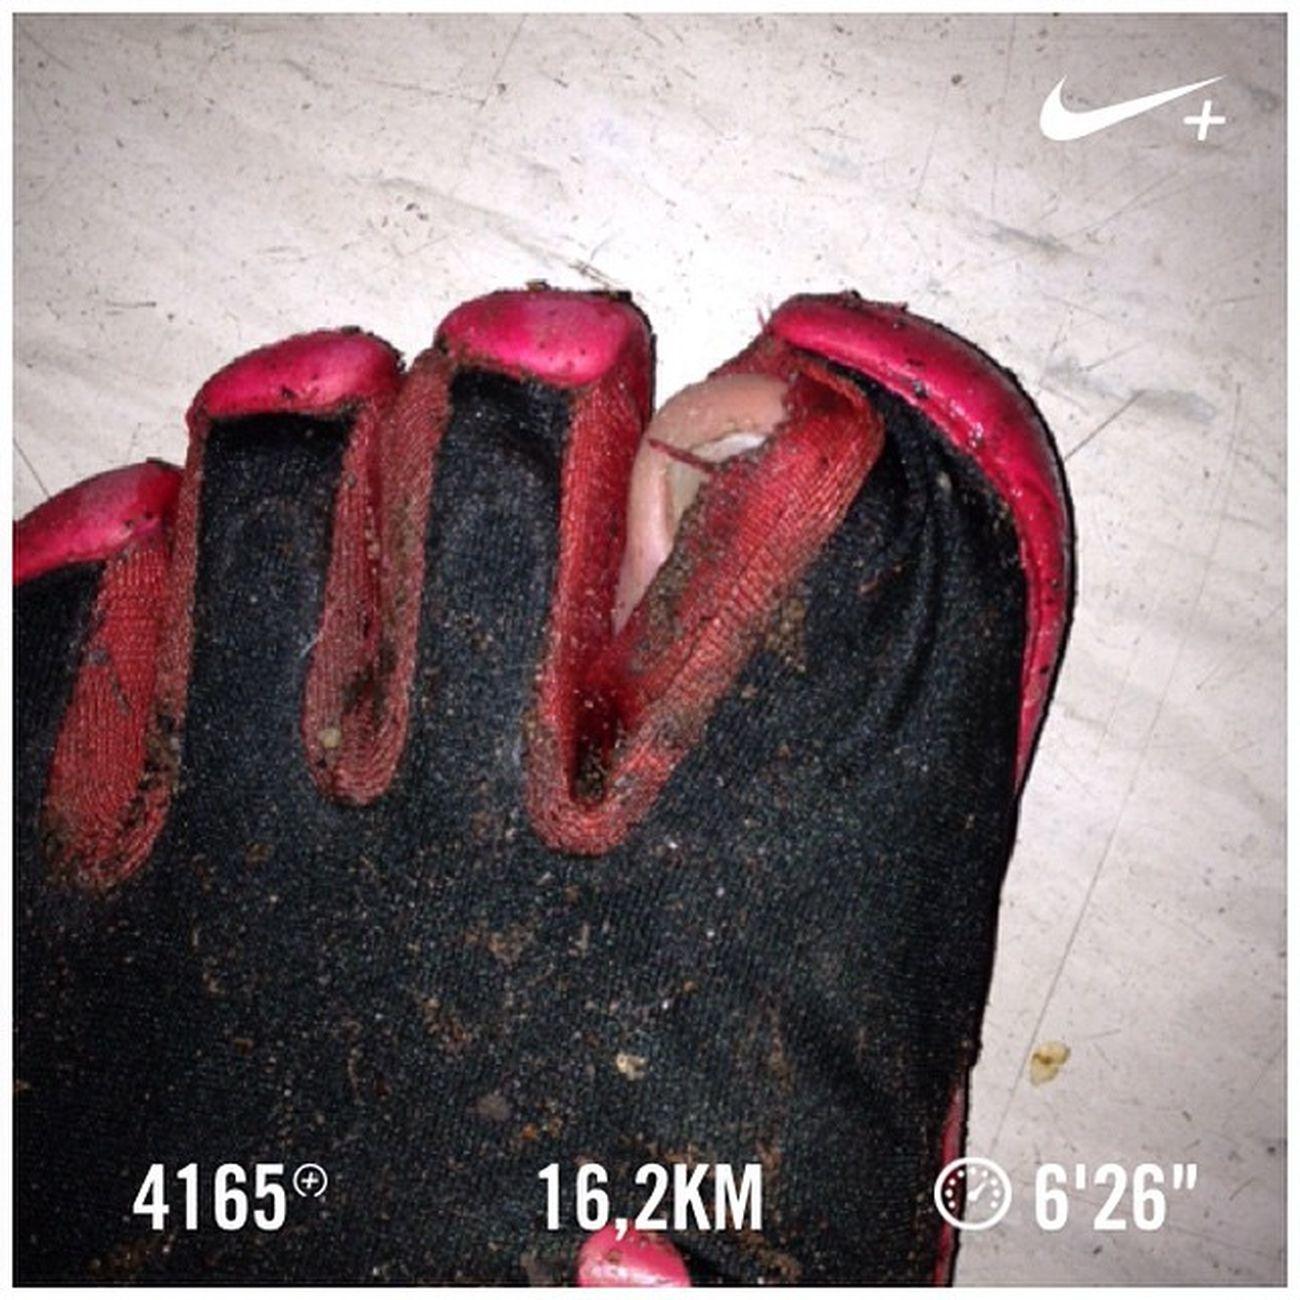 Running Snow Nike Trailrunning Nikeplus Nikerunning Halfmarathontraining Ismoothrun Gipis Smashrun